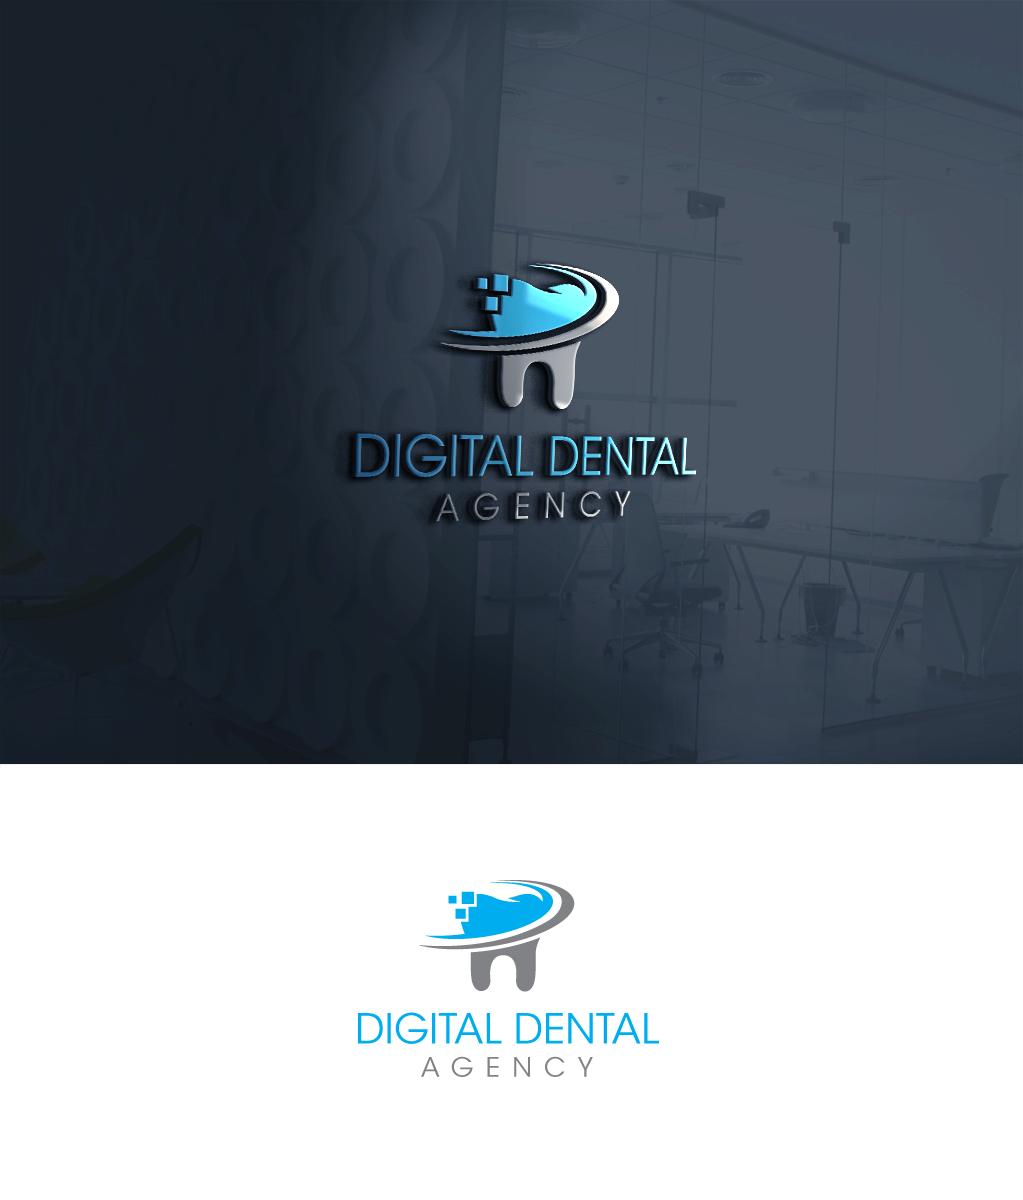 Logo Design by benhur - Entry No. 68 in the Logo Design Contest Imaginative Logo Design for Digital Dental Agency.